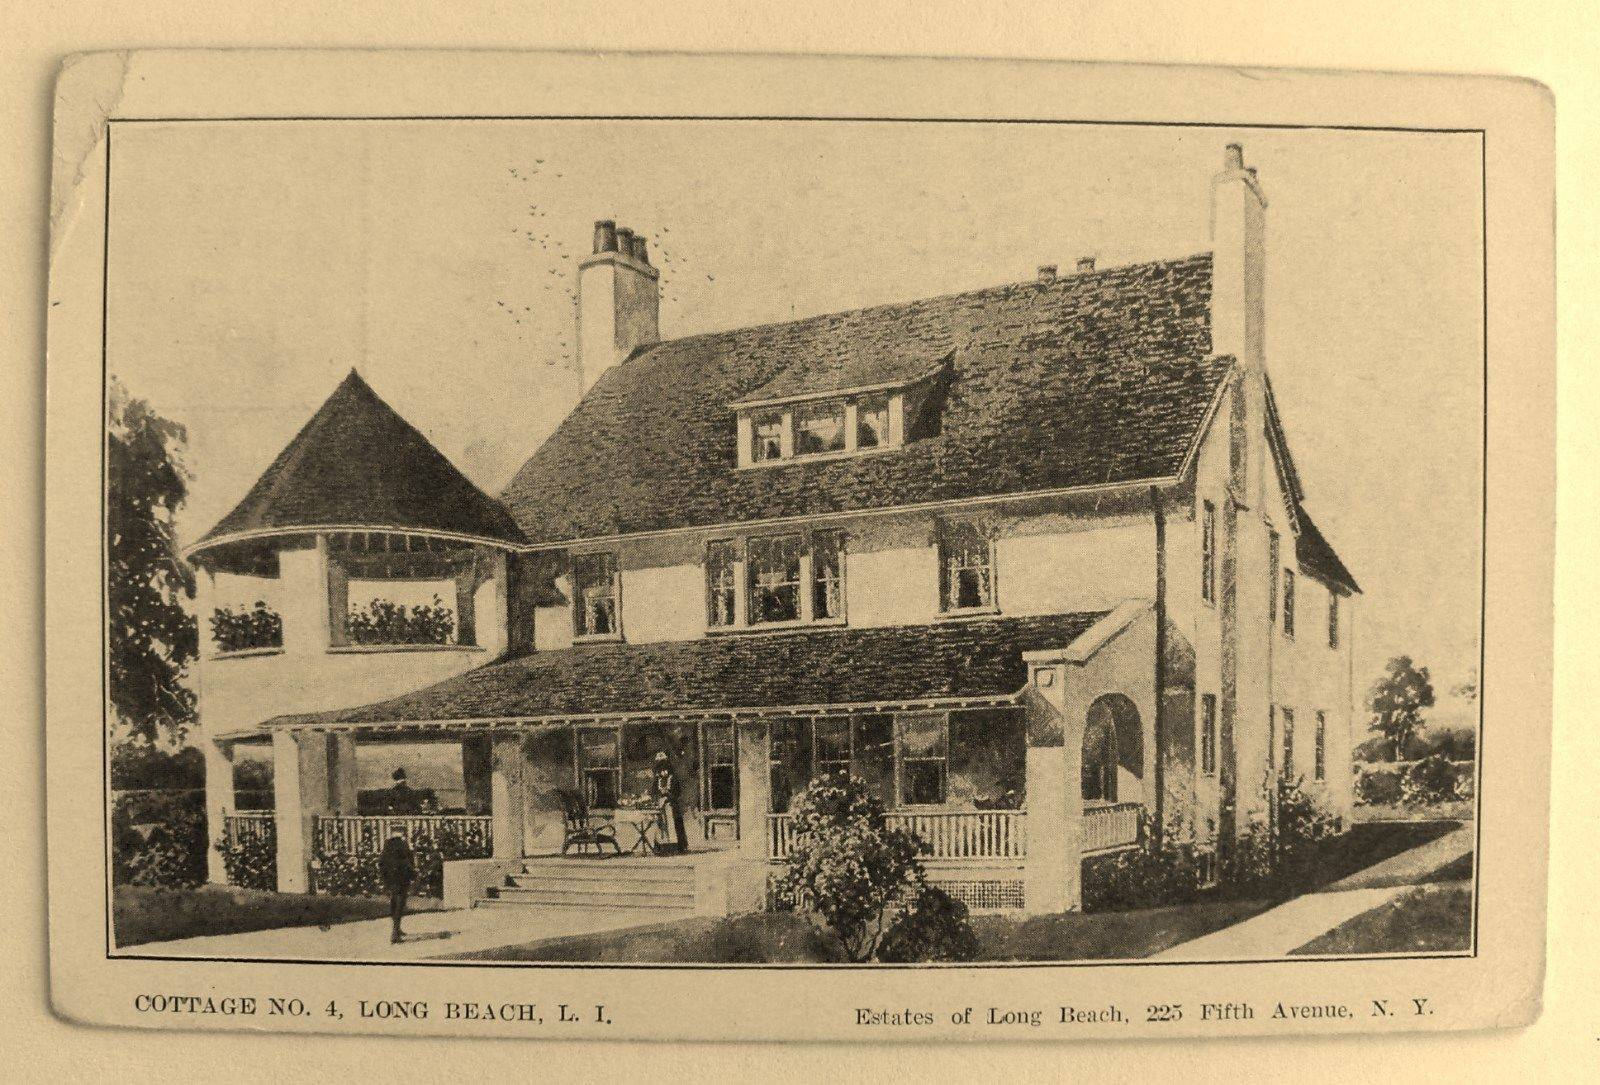 Hotel Long Beach Cottage 4 Estates of Long Beach.jpg